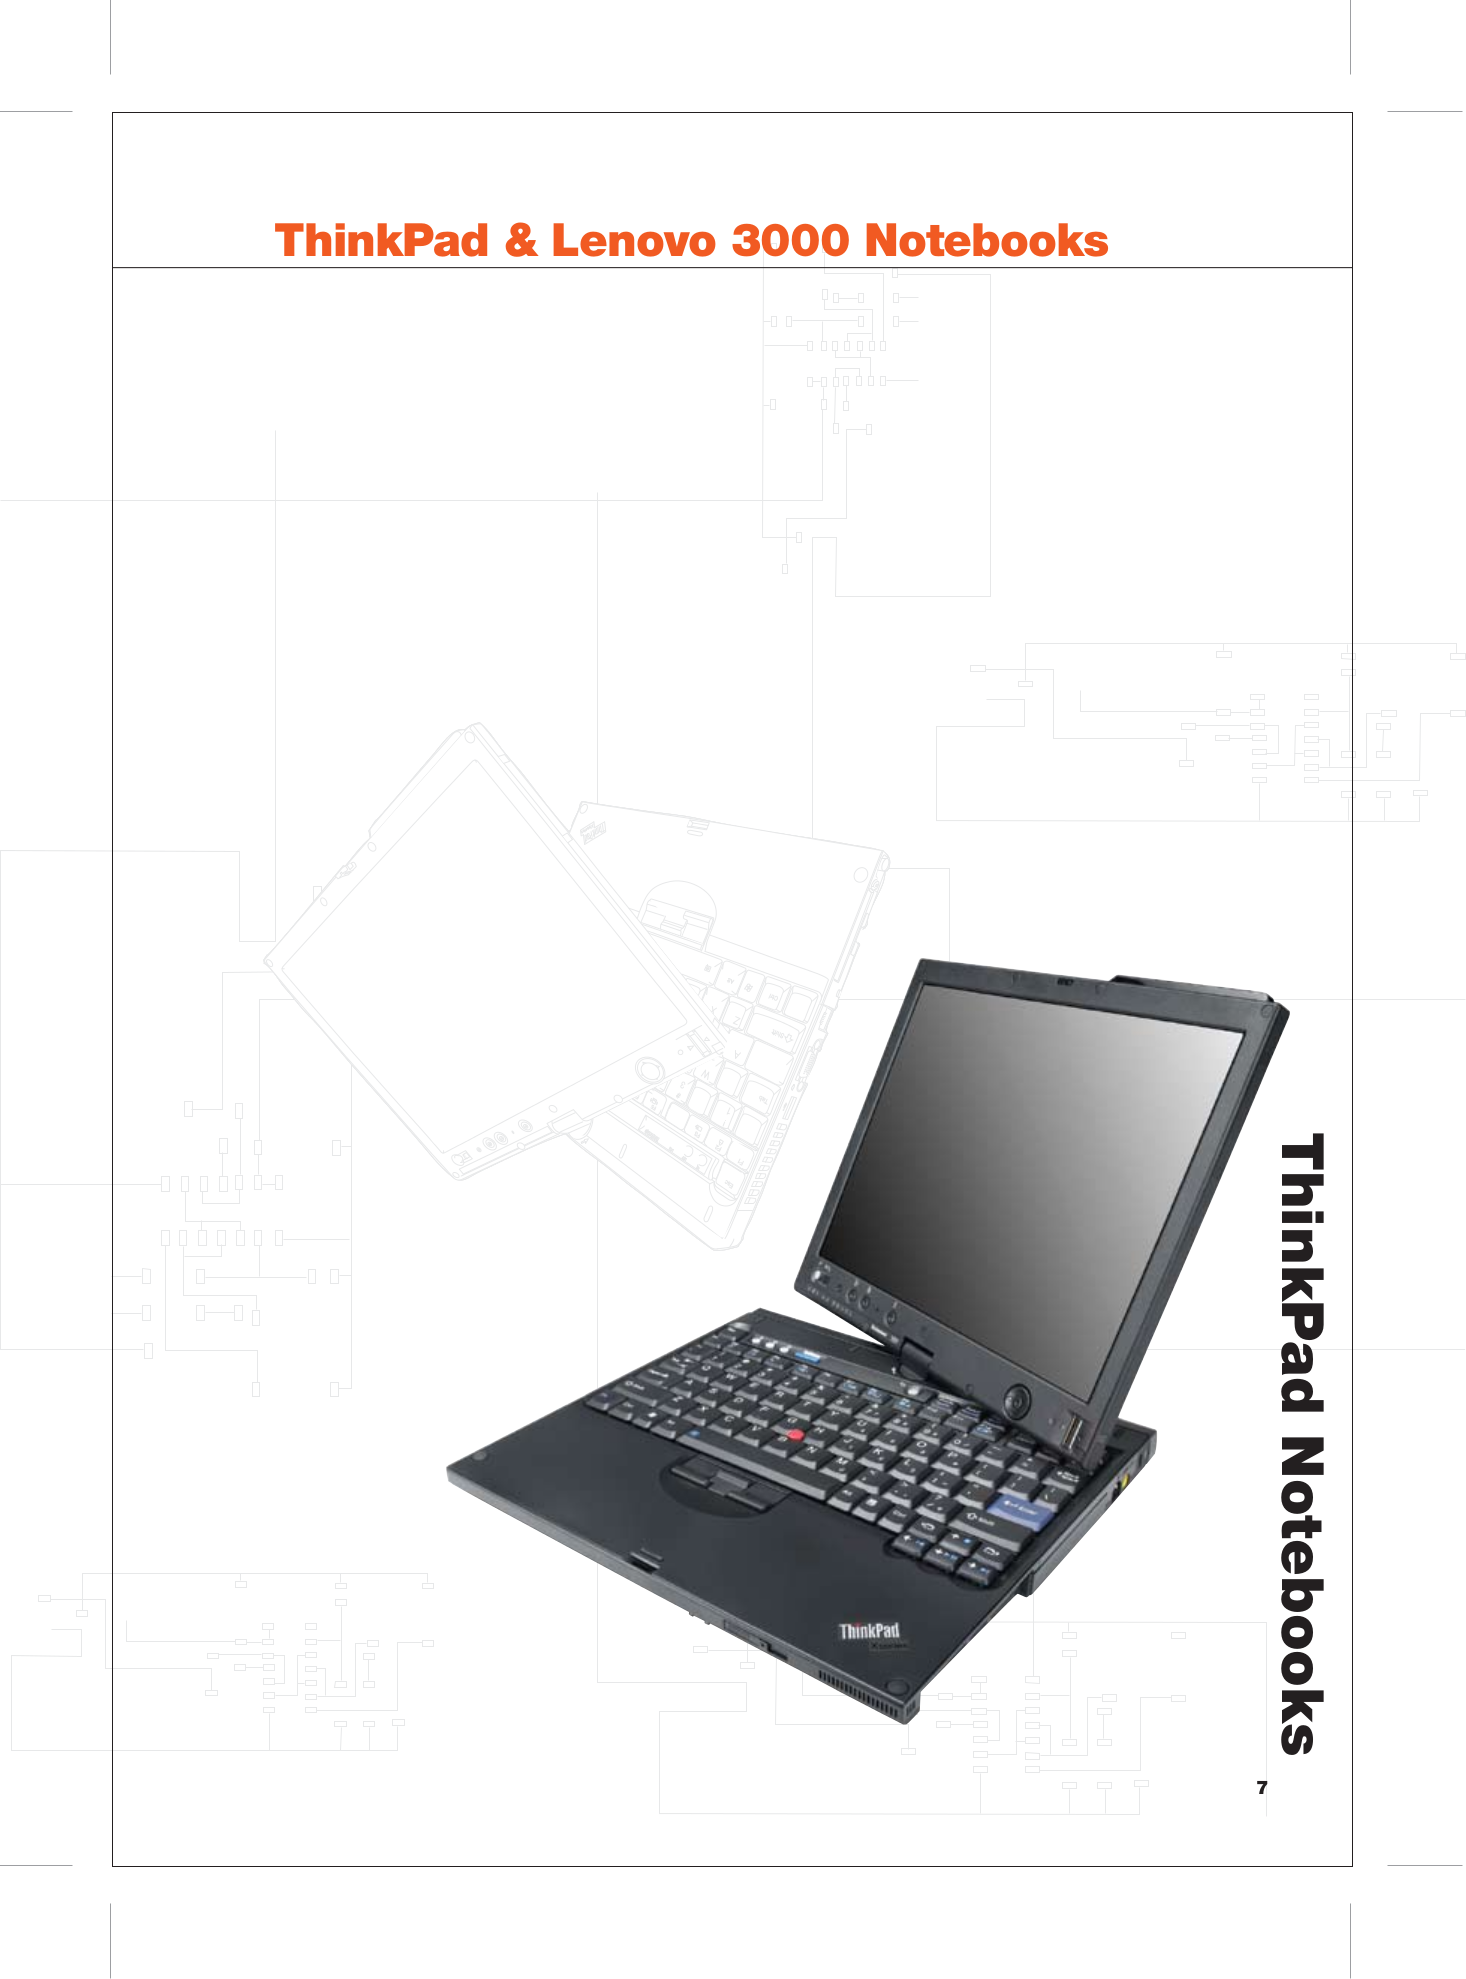 pdf manual for lenovo laptop 3000 n200 0769 rh umlib com Lenovo 3000 N200 Keyboard Lenovo 11E Chromebook